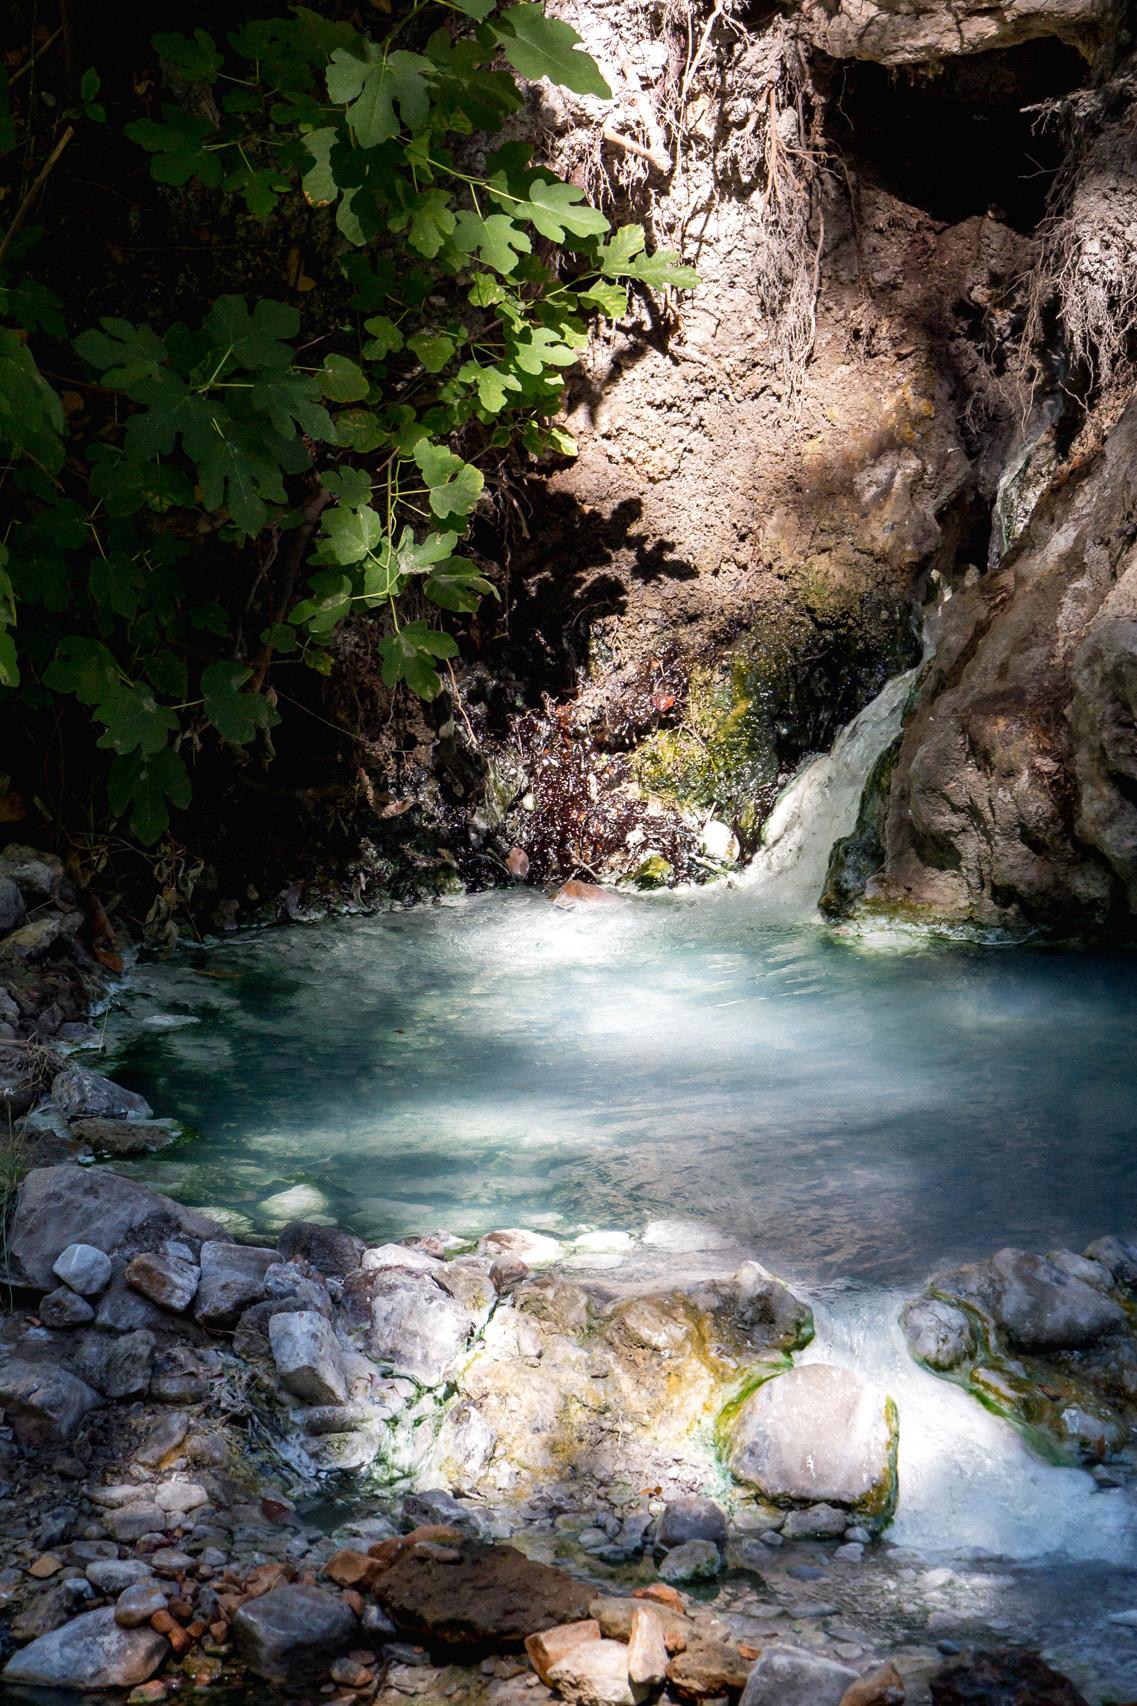 Bagni San Filippo pools